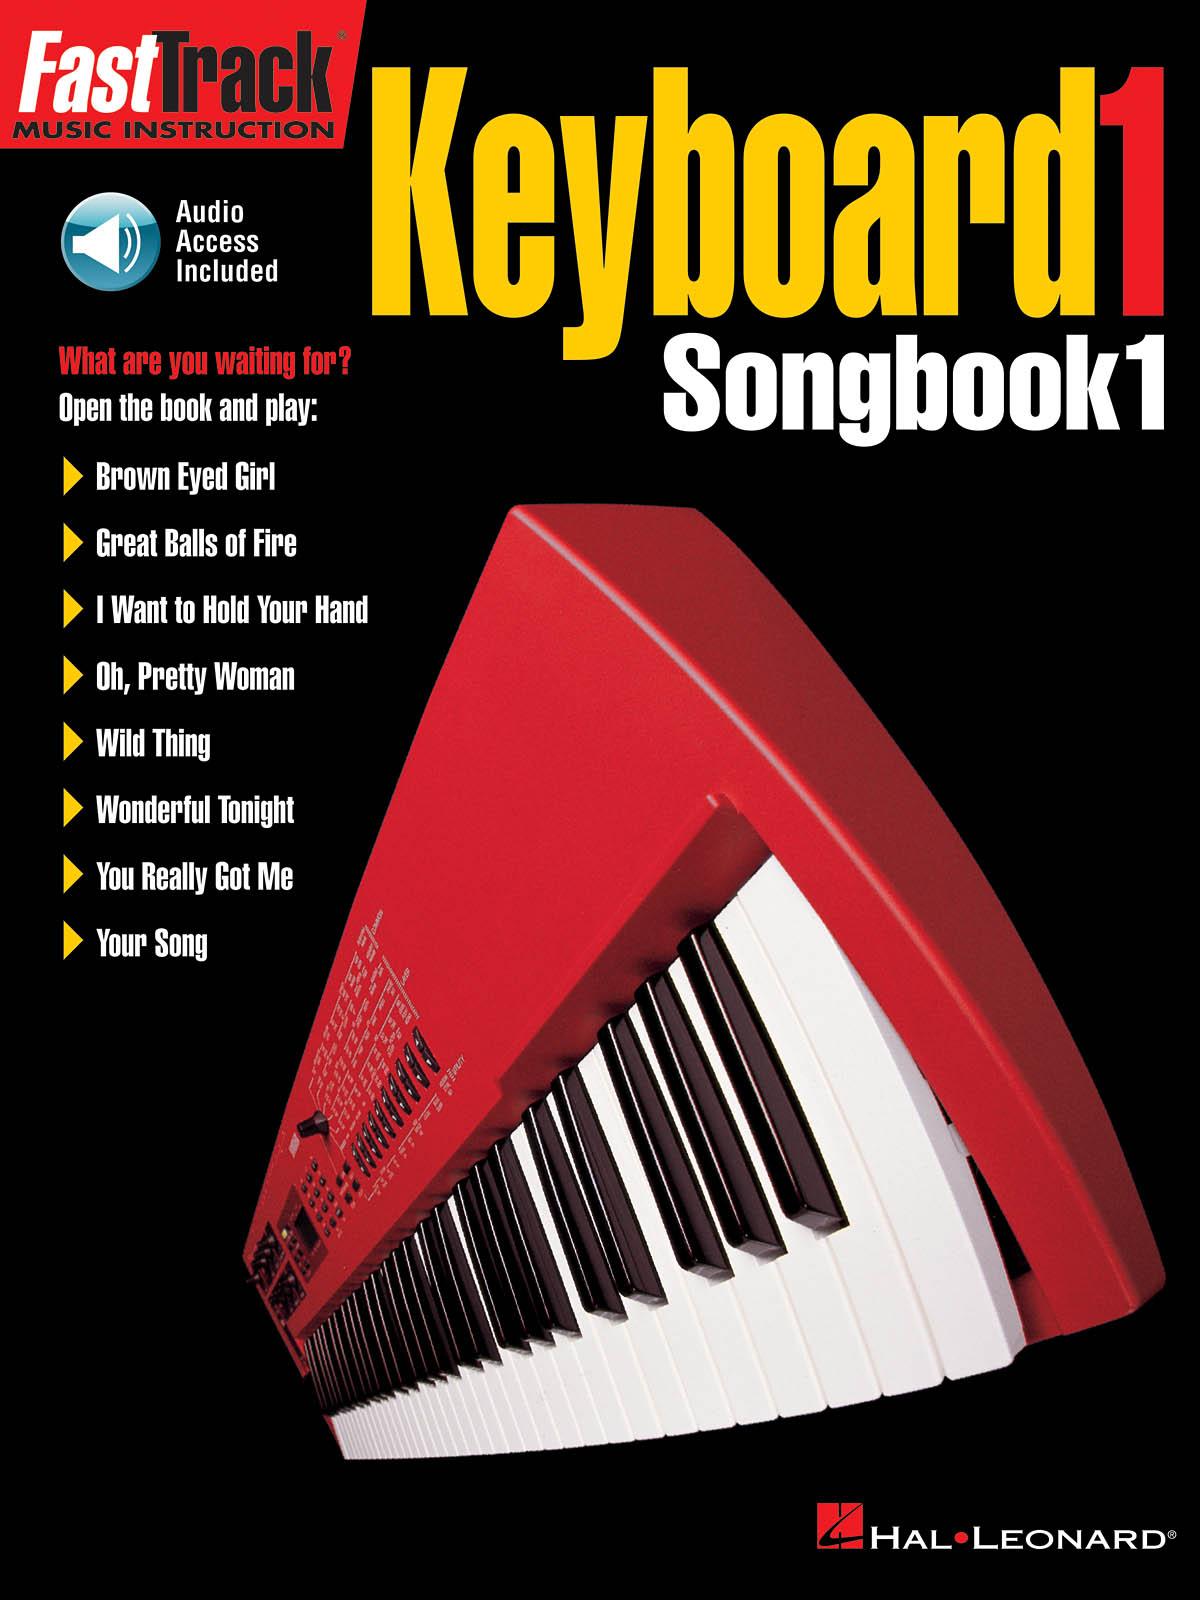 FastTrack - Keyboard 1 - Songbook 1: Electric Keyboard: Mixed Songbook